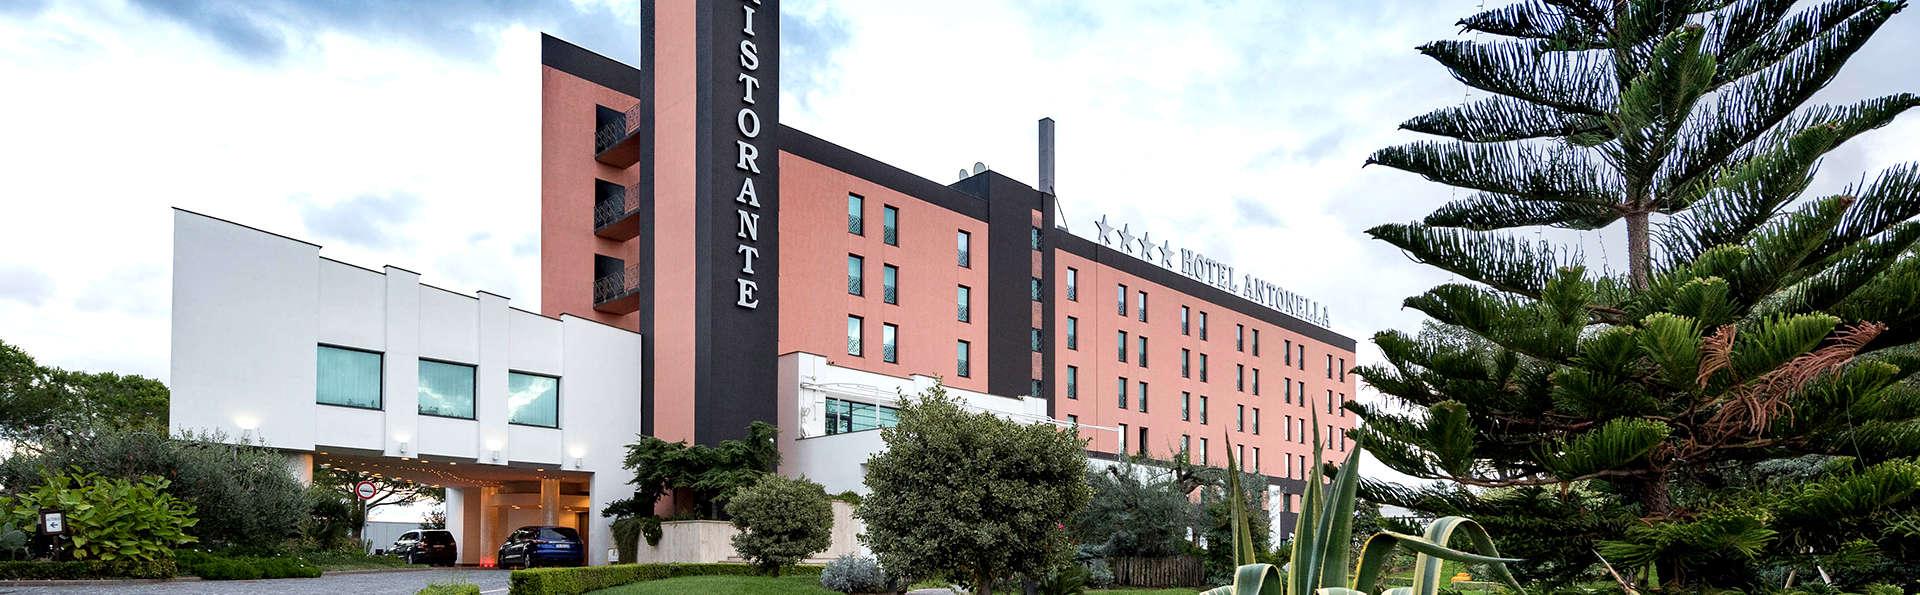 Hotel Antonella - EDIT_NEW_FRONT.jpg